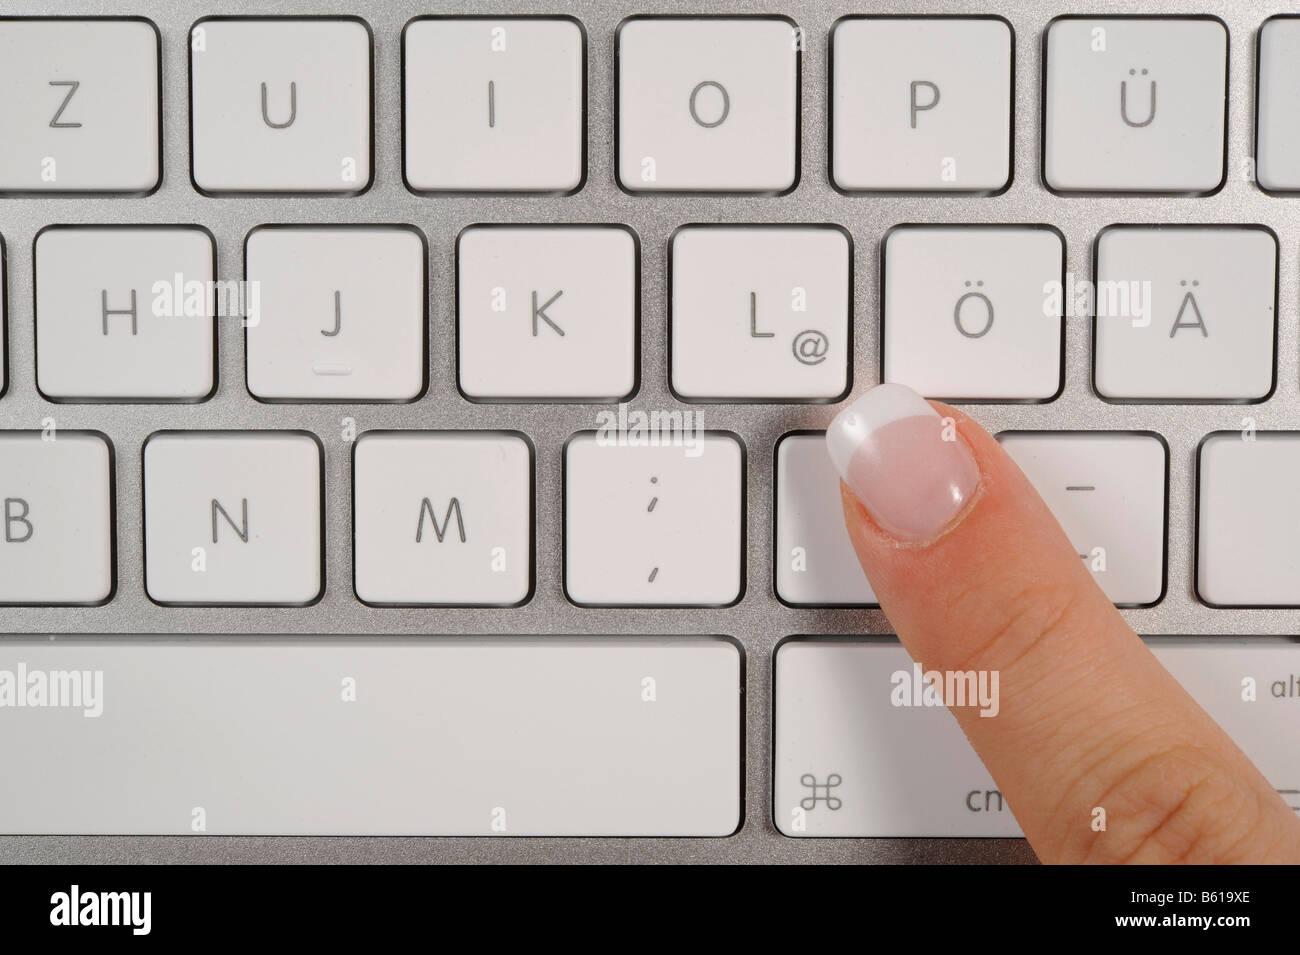 Keyboard of an apple macbook pro notebook finger pointing to the keyboard of an apple macbook pro notebook finger pointing to the symbol biocorpaavc Choice Image